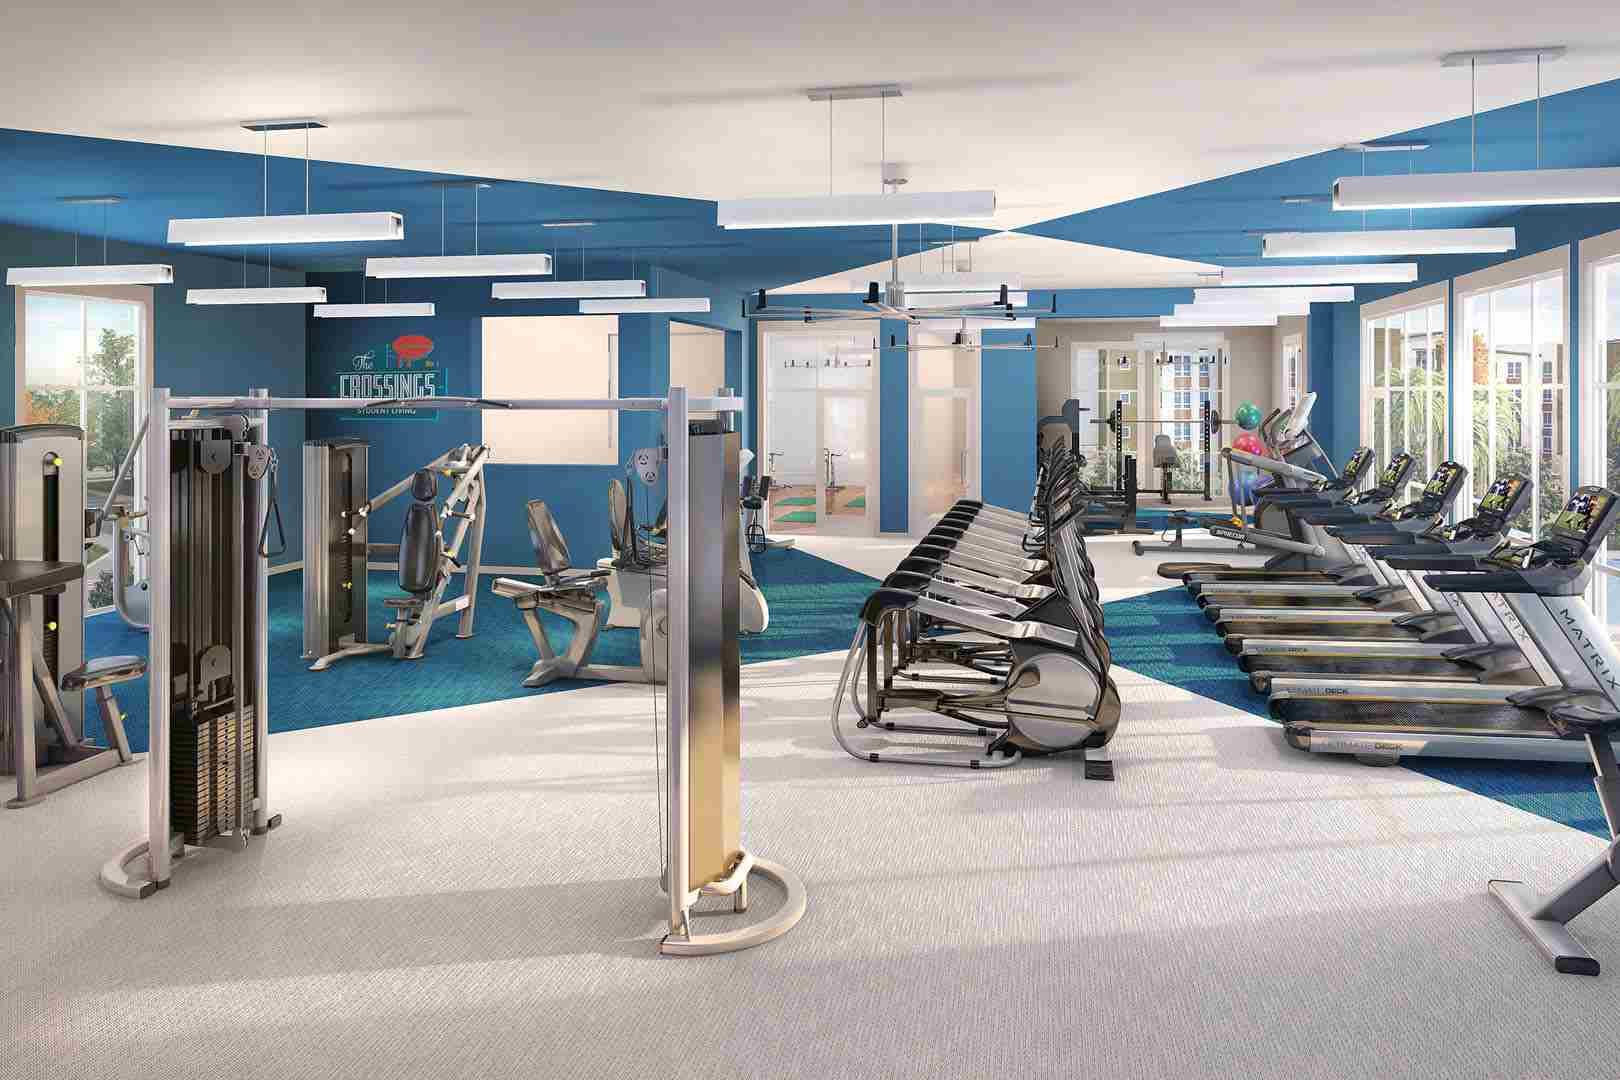 The-Crossings-Student-Living-Sacramento-CA-Fitness-Center-Unilodgers